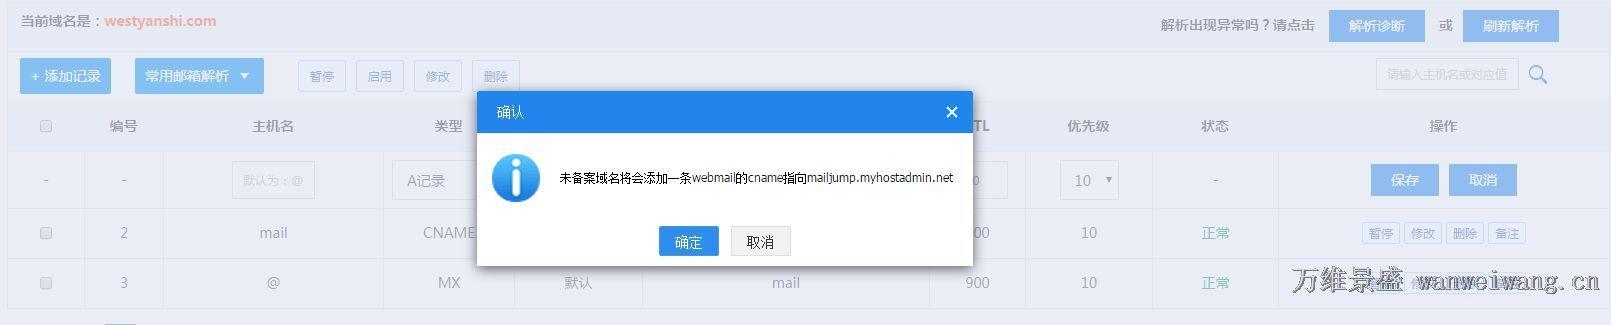 自动添加CNAME记录